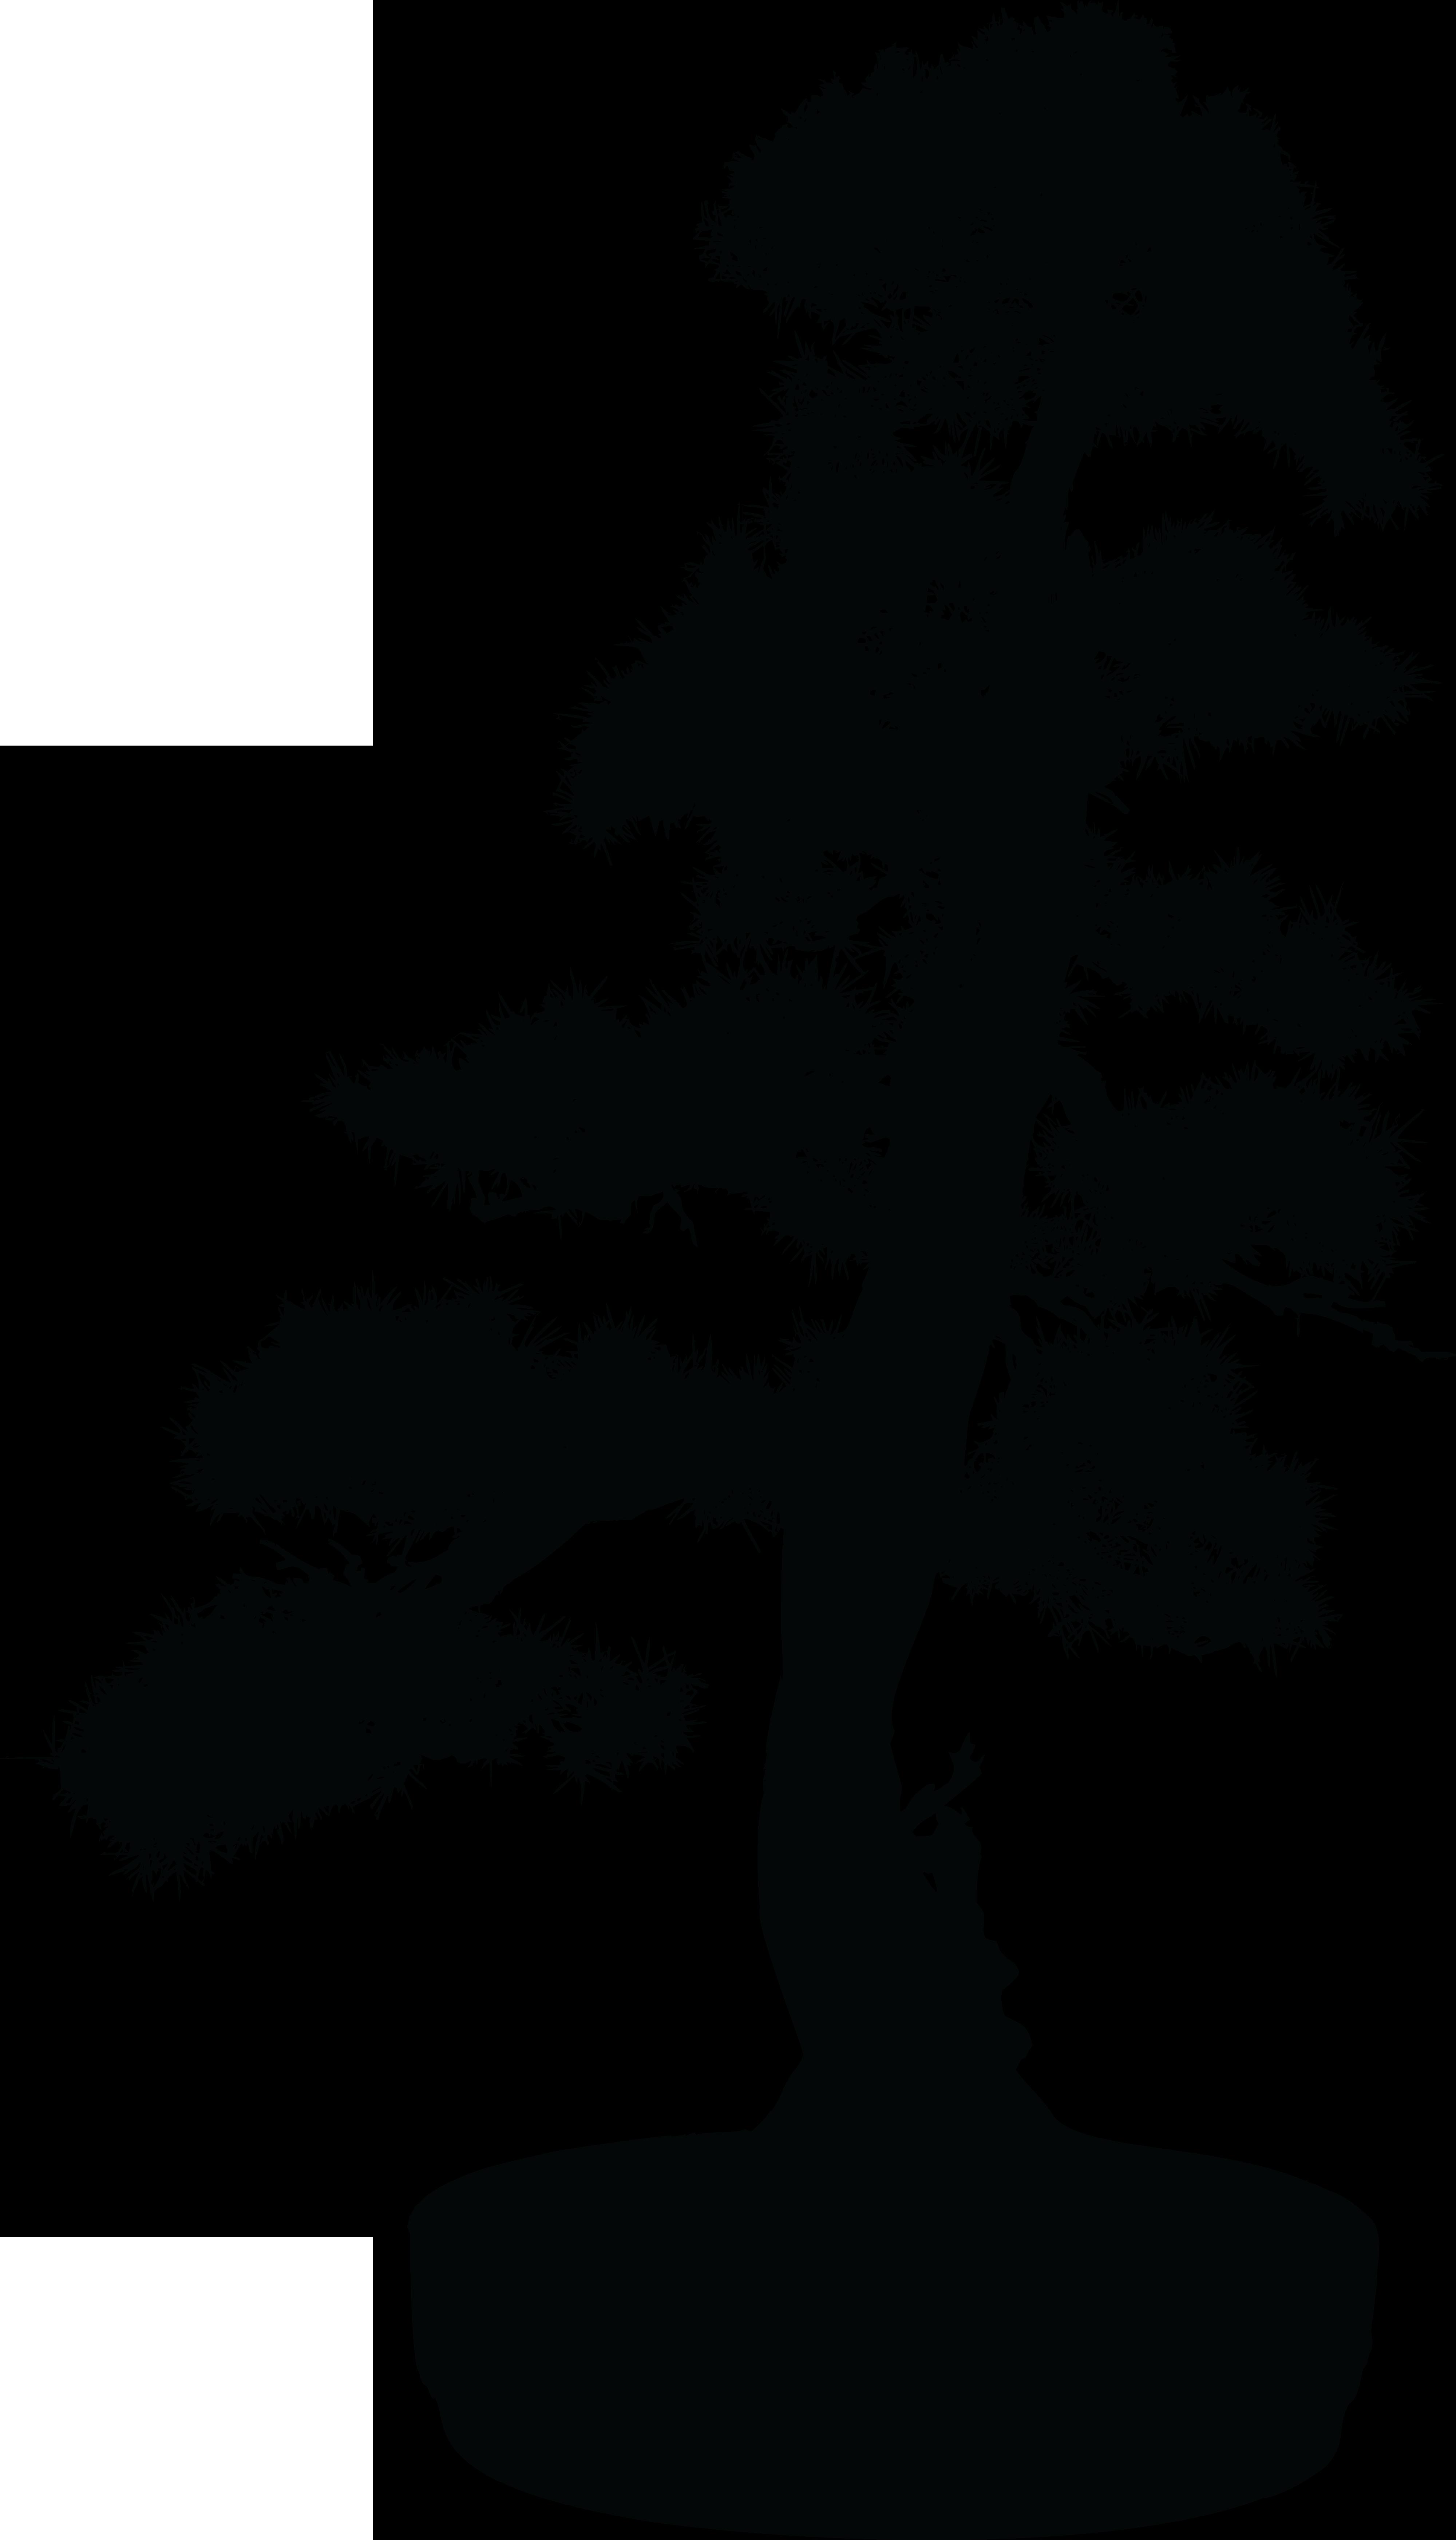 Bonsai Tree Silhouette Clip art.